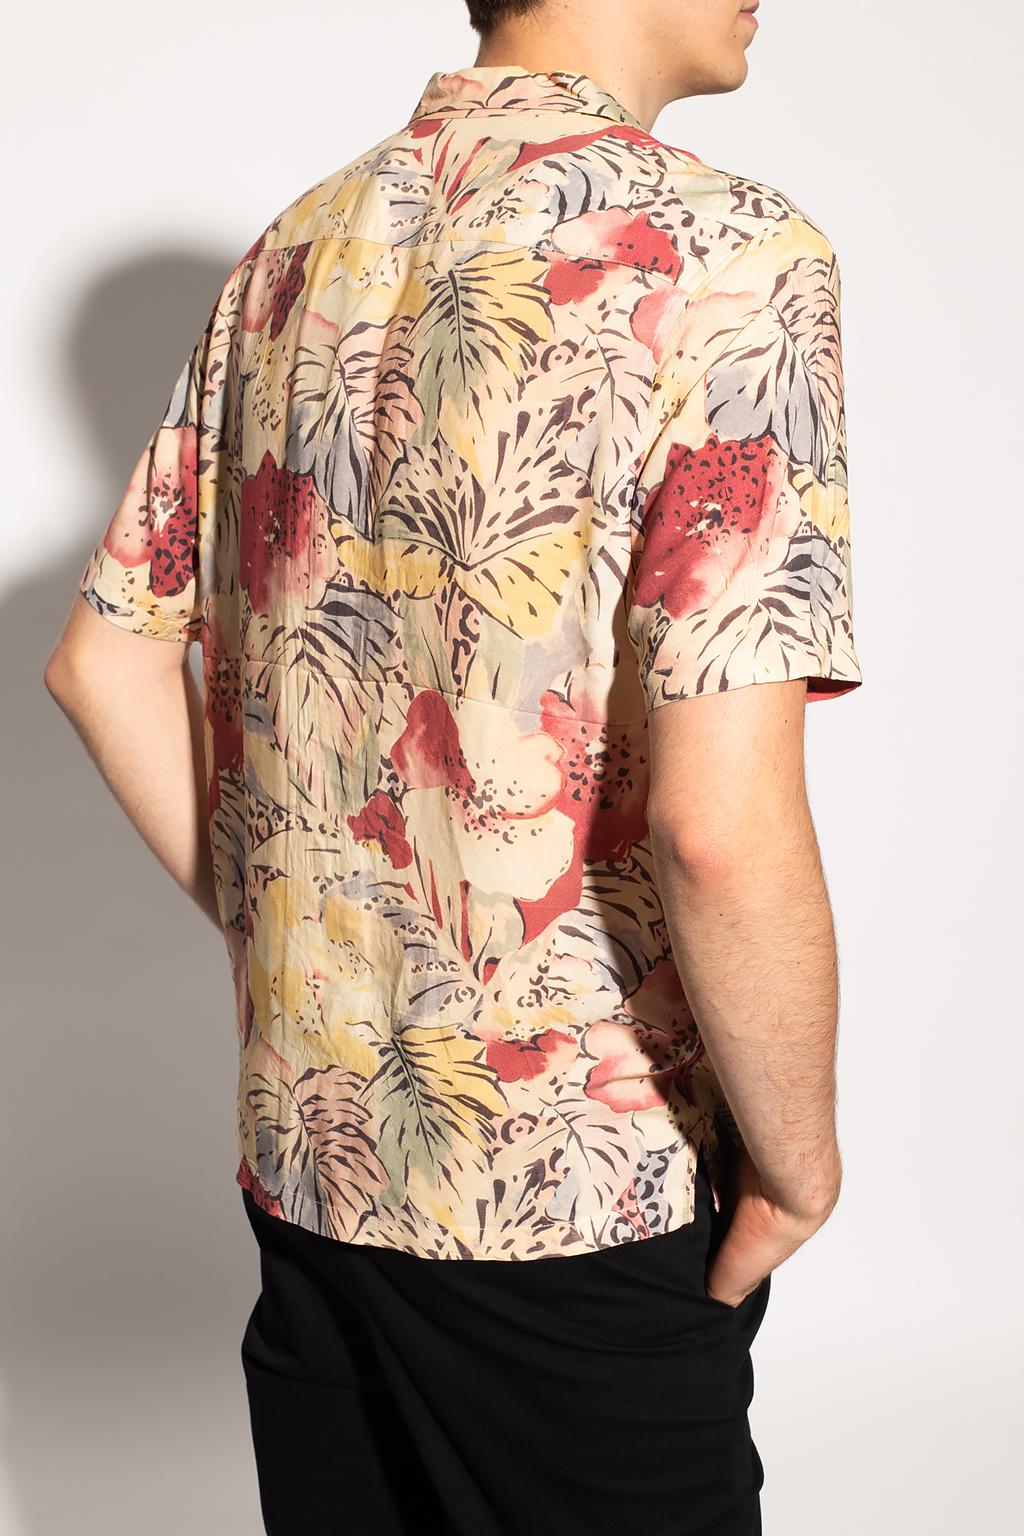 AllSaints 'Wailea' shirt